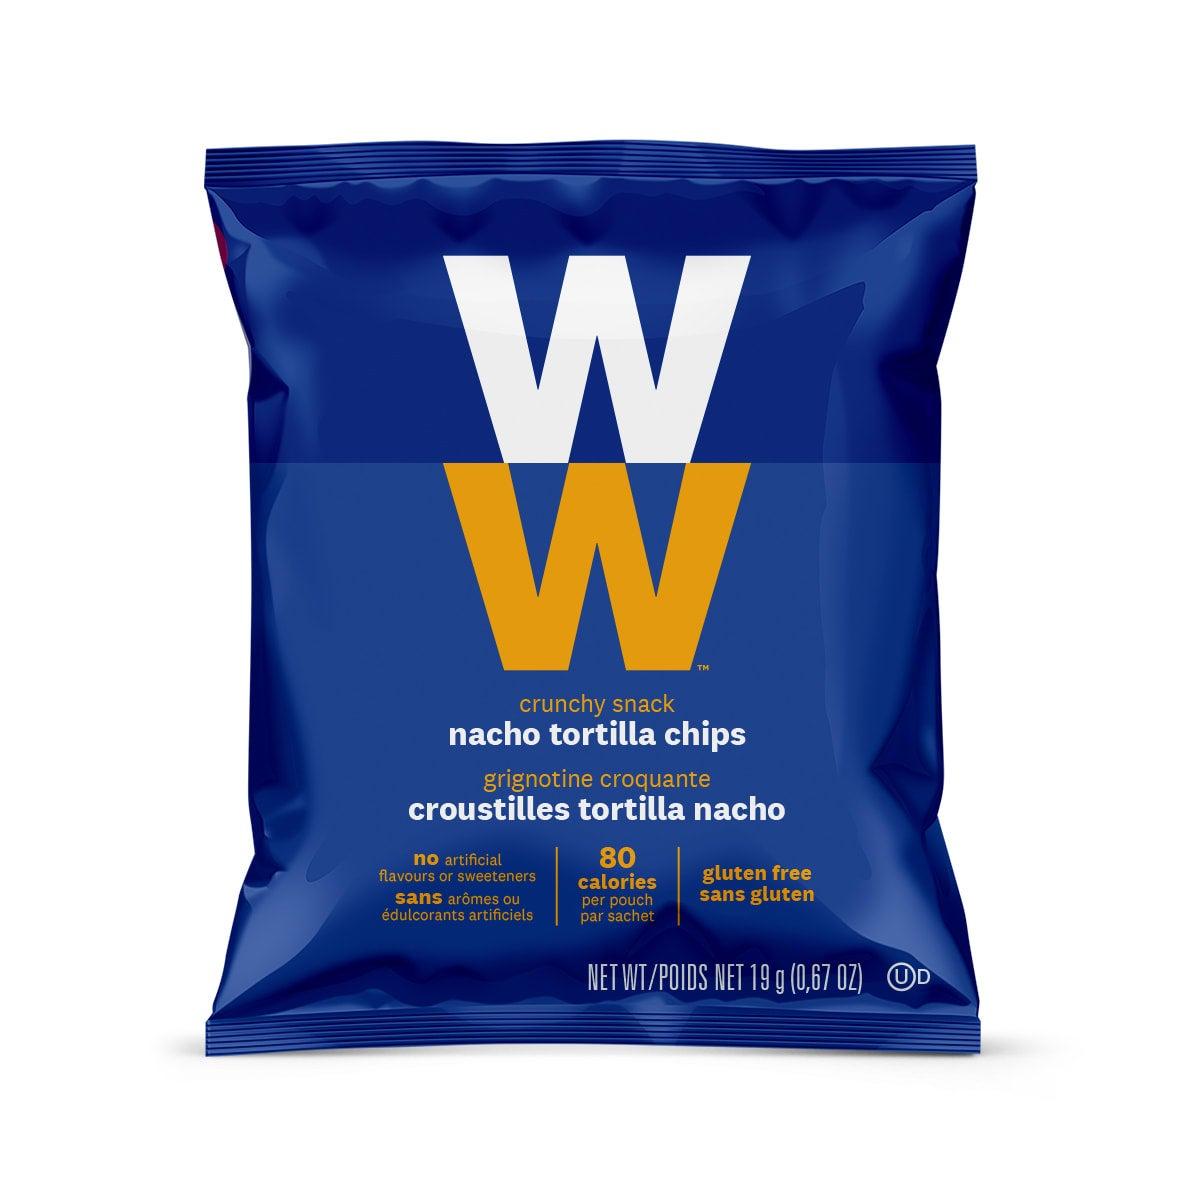 Nacho Tortilla Chips (3 Pack) - front of bag